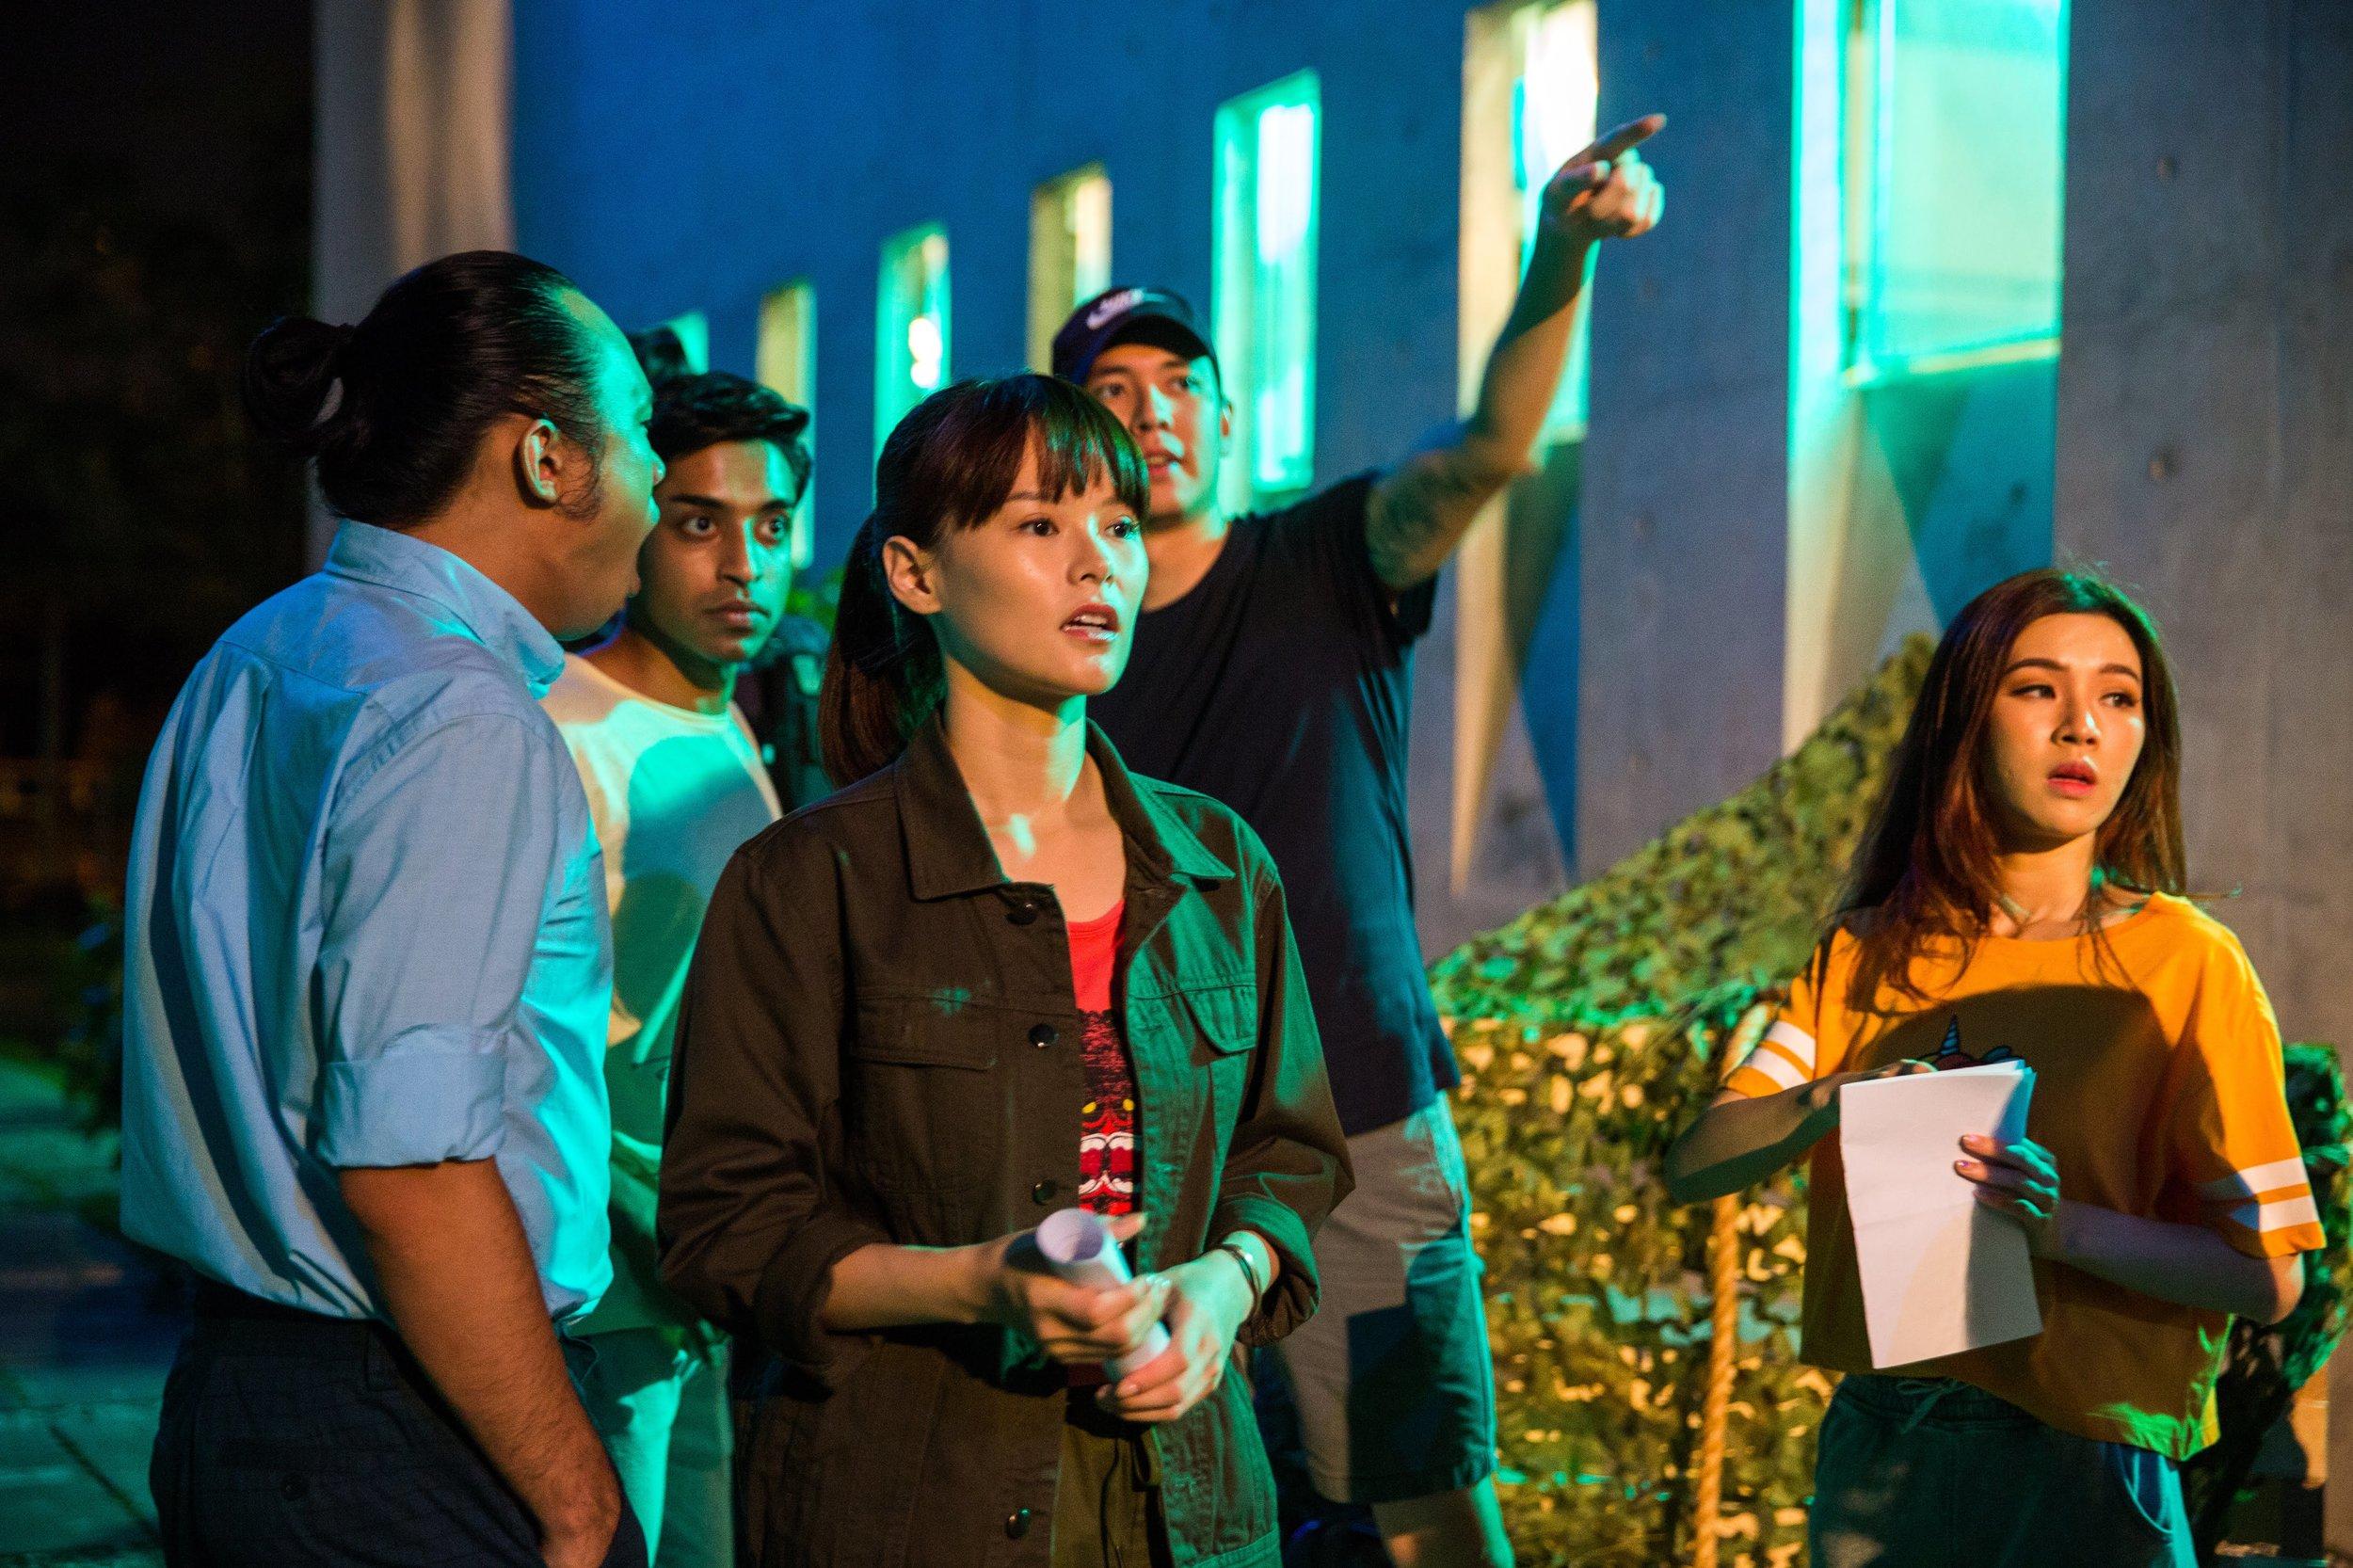 Nicholas Lo directing Jayley Woo, Nicole Changmin, Kishan J., Aaron Koo in episode 4.